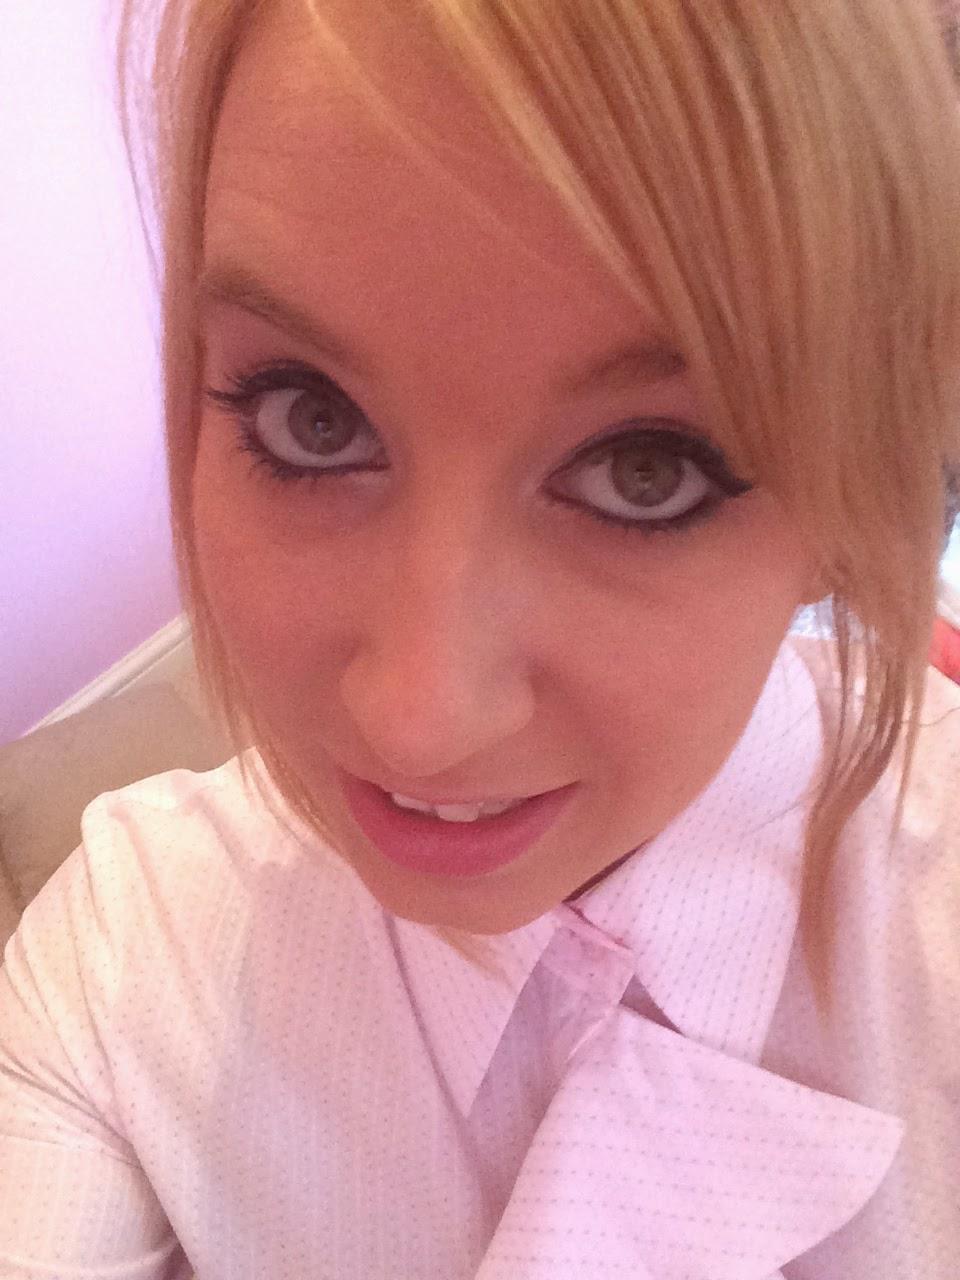 DollfaceBlogs | Makeup for interviews